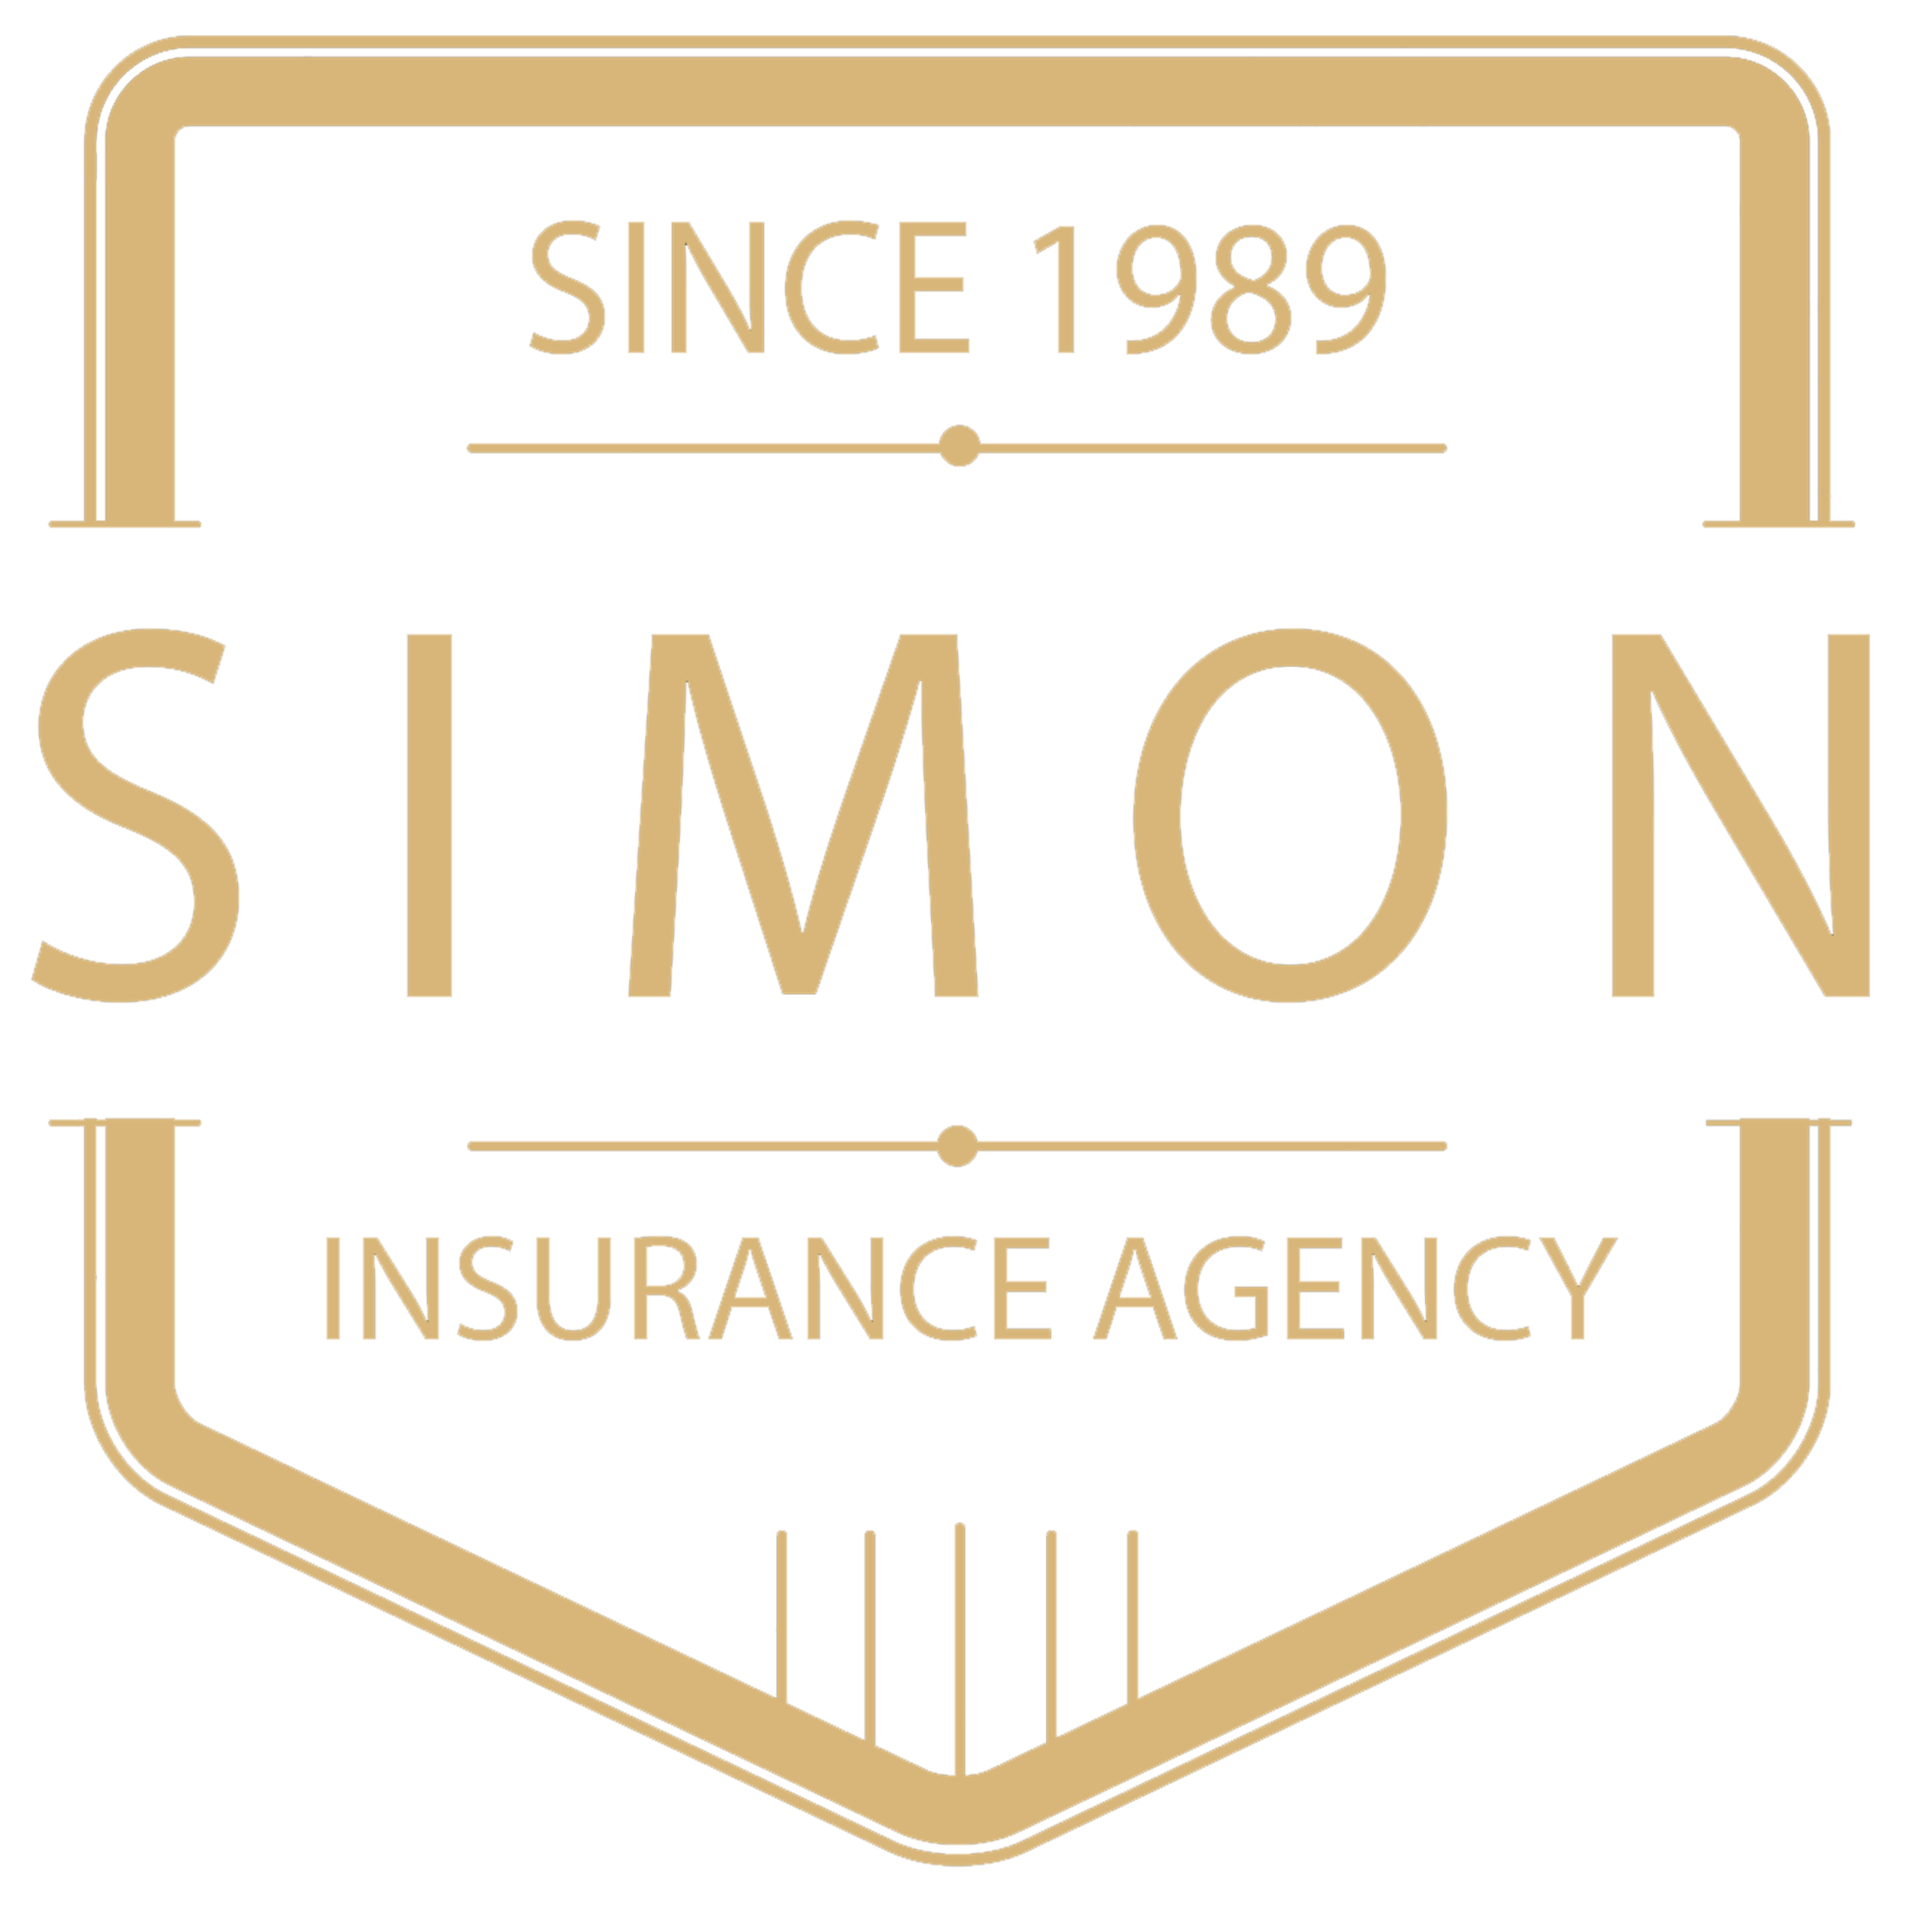 Fred Loya Insurance Quote: Commerce Company At 3100 Kerner Blvd, Ste E, San Rafael